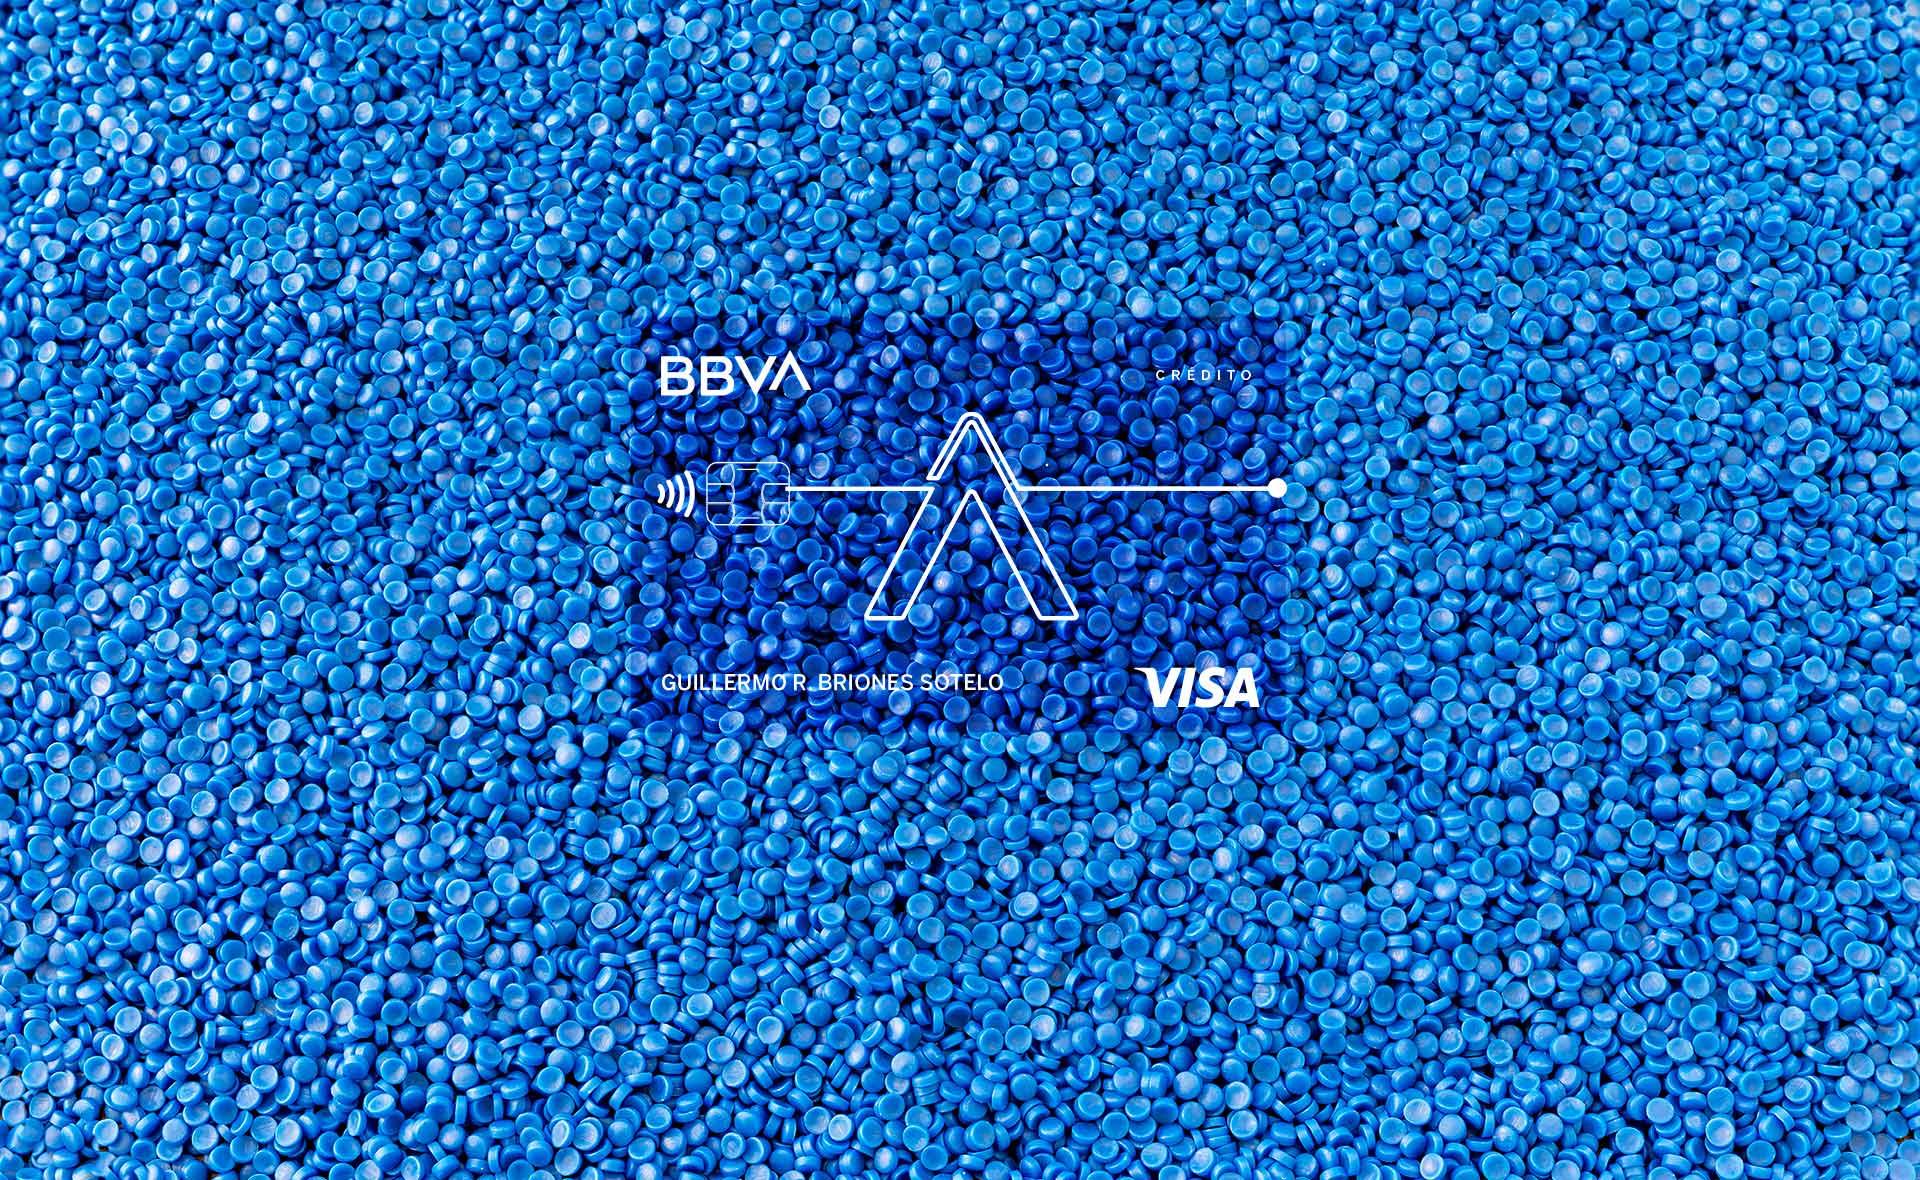 BBVA-tarjetas-recicladas-apertura